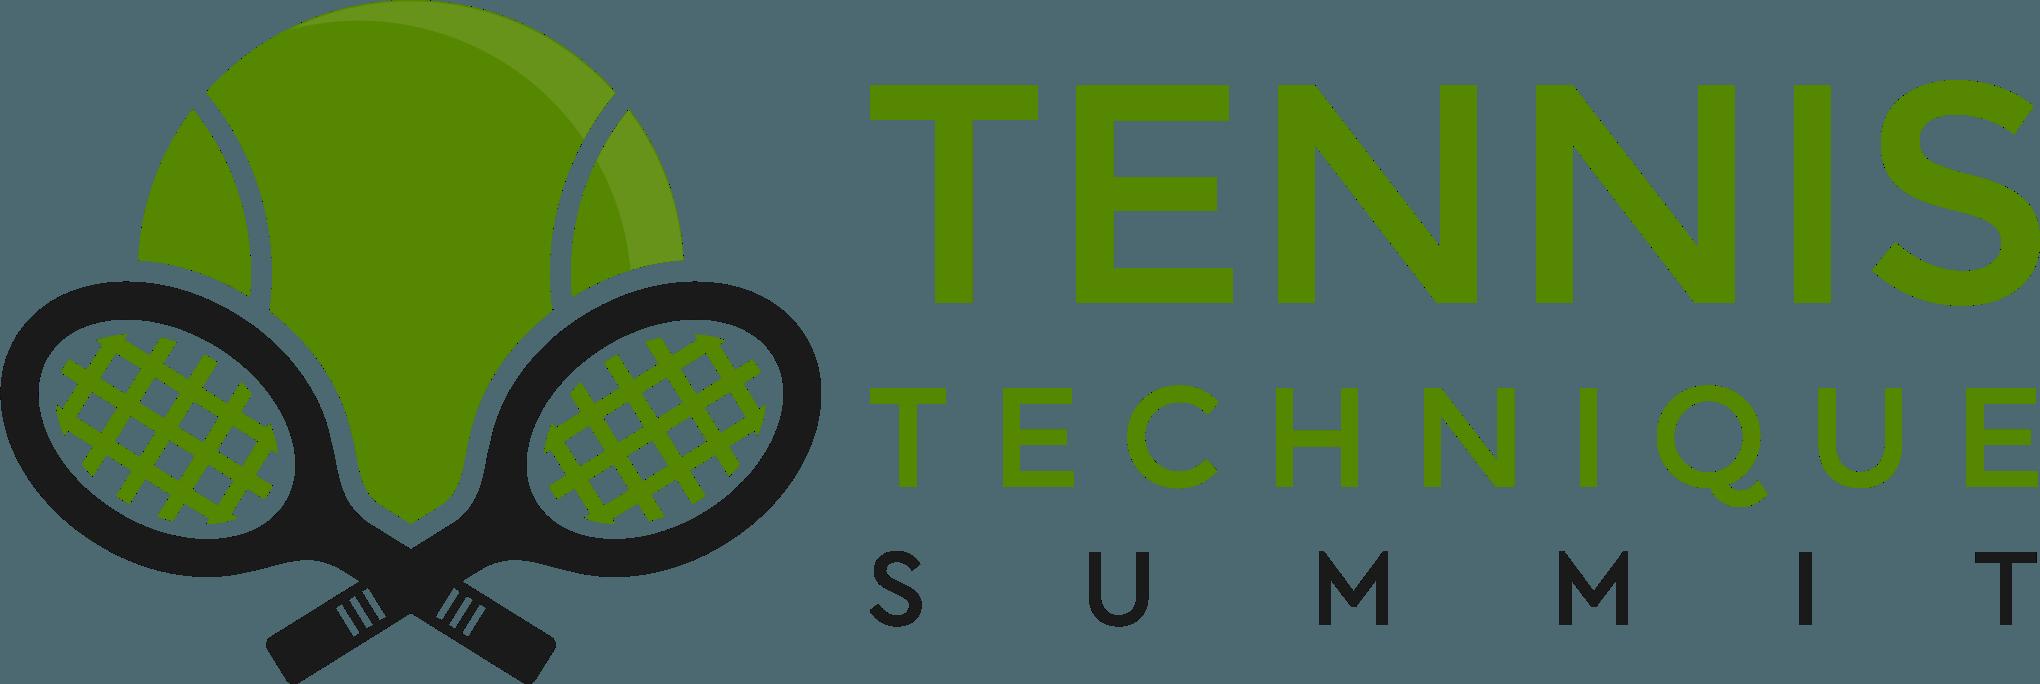 Summit clipart class discussion Coaches Tennis Logo Technique Class